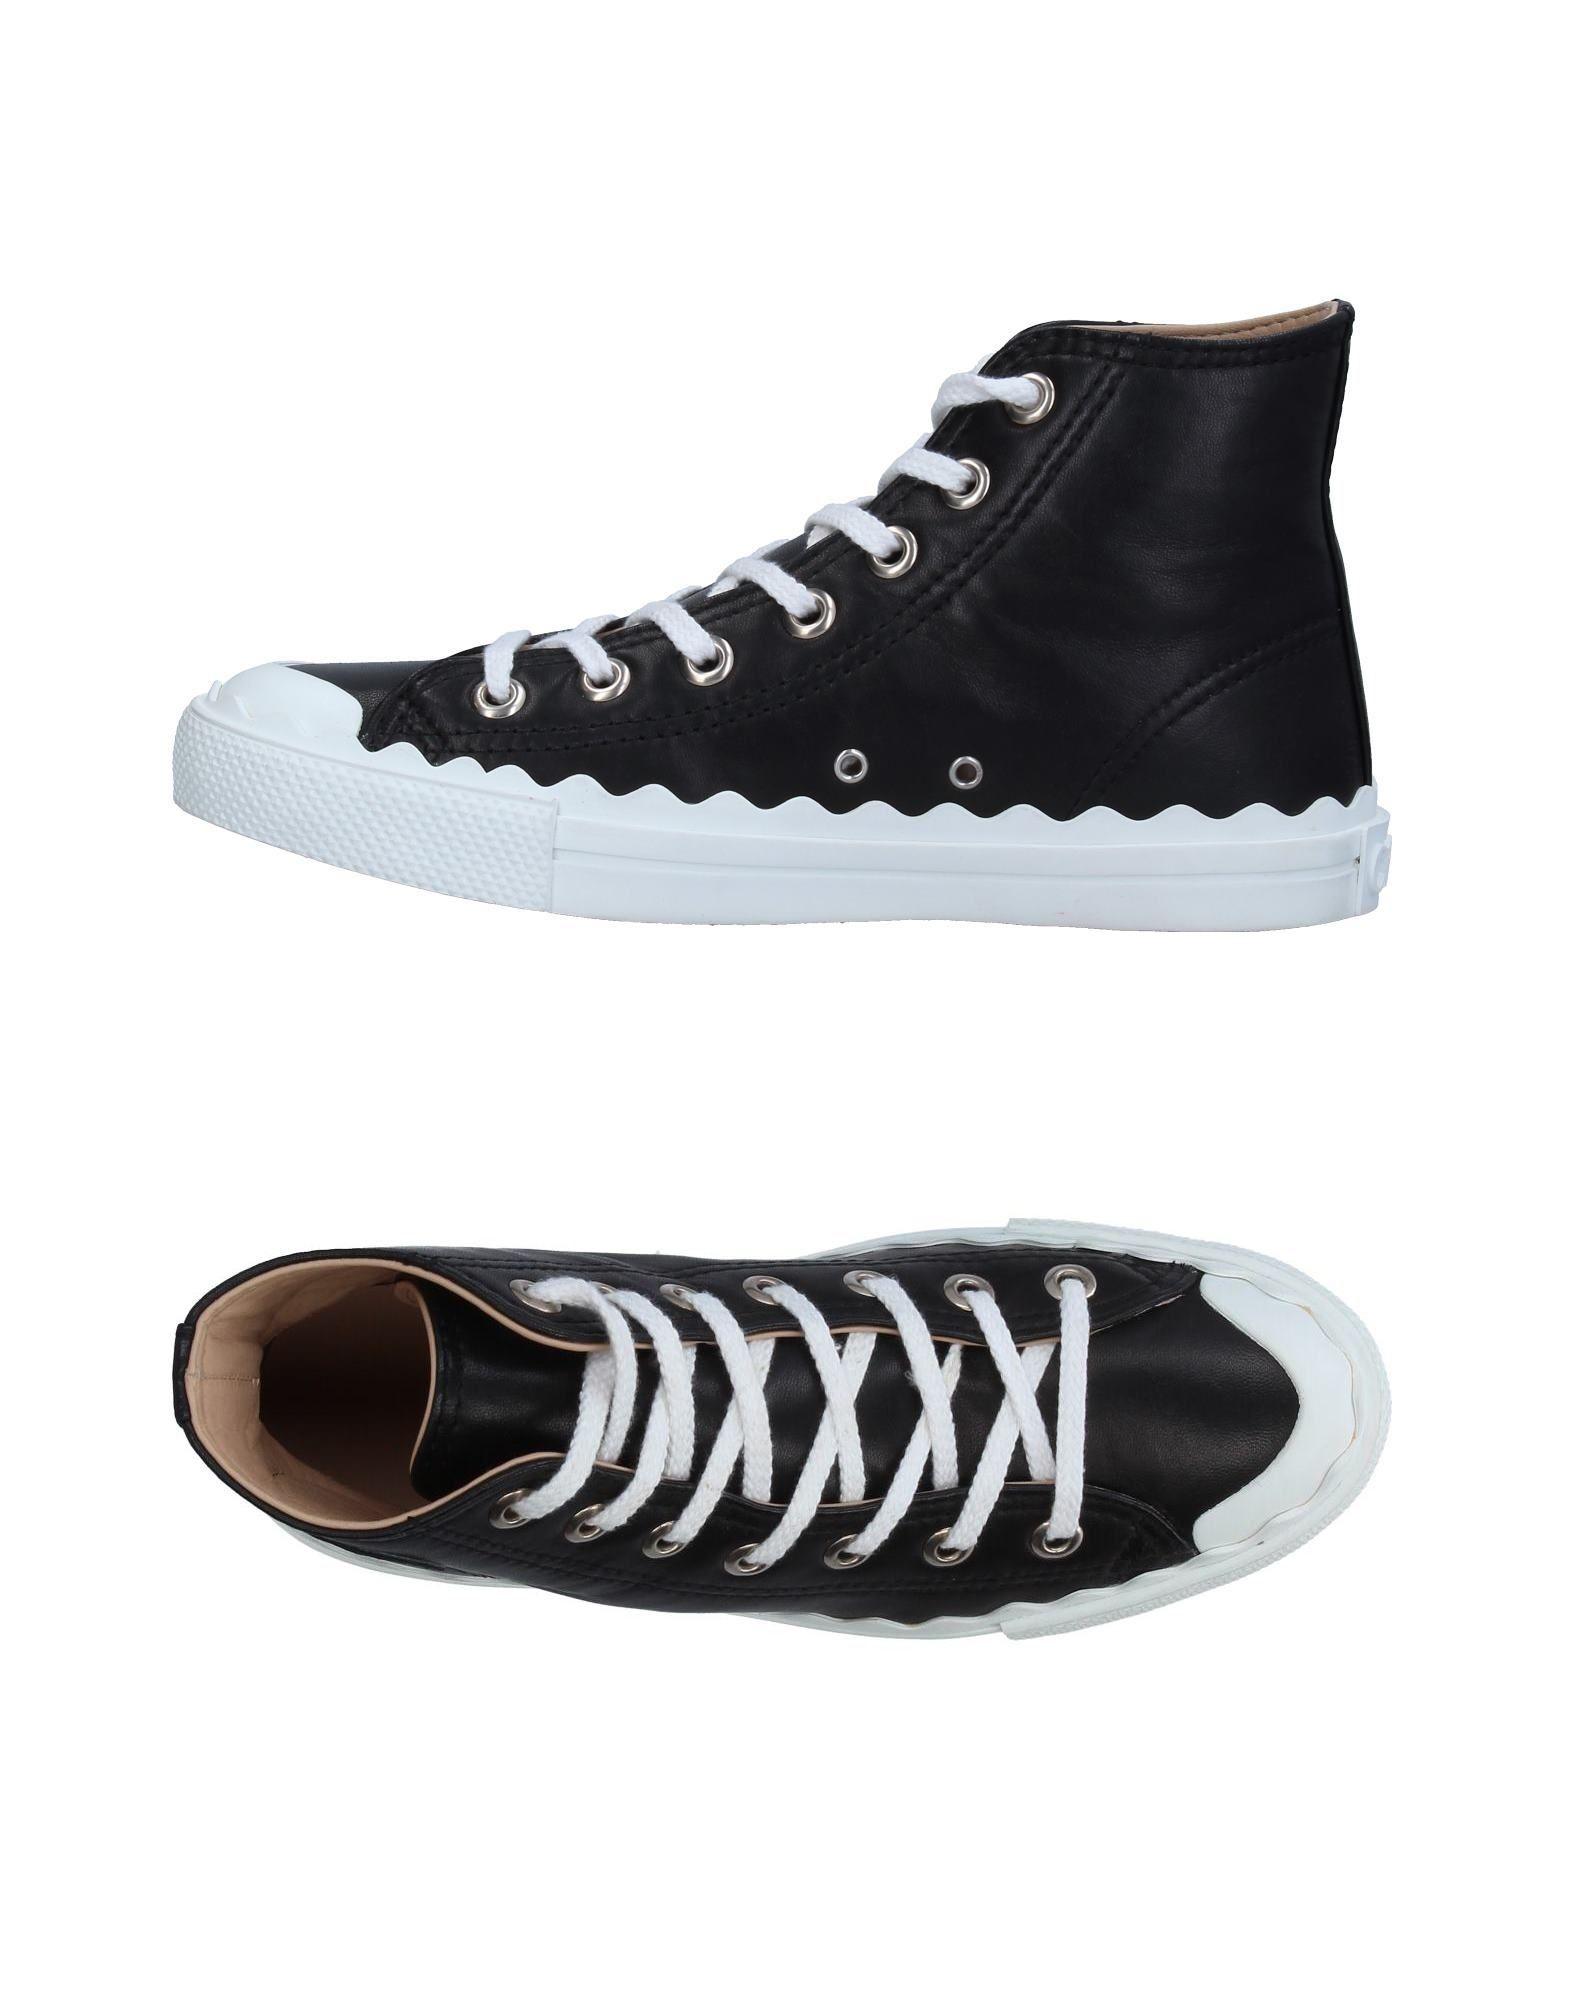 CHLOÉ Высокие кеды и кроссовки кеды кроссовки высокие dc council mid tx stone camo